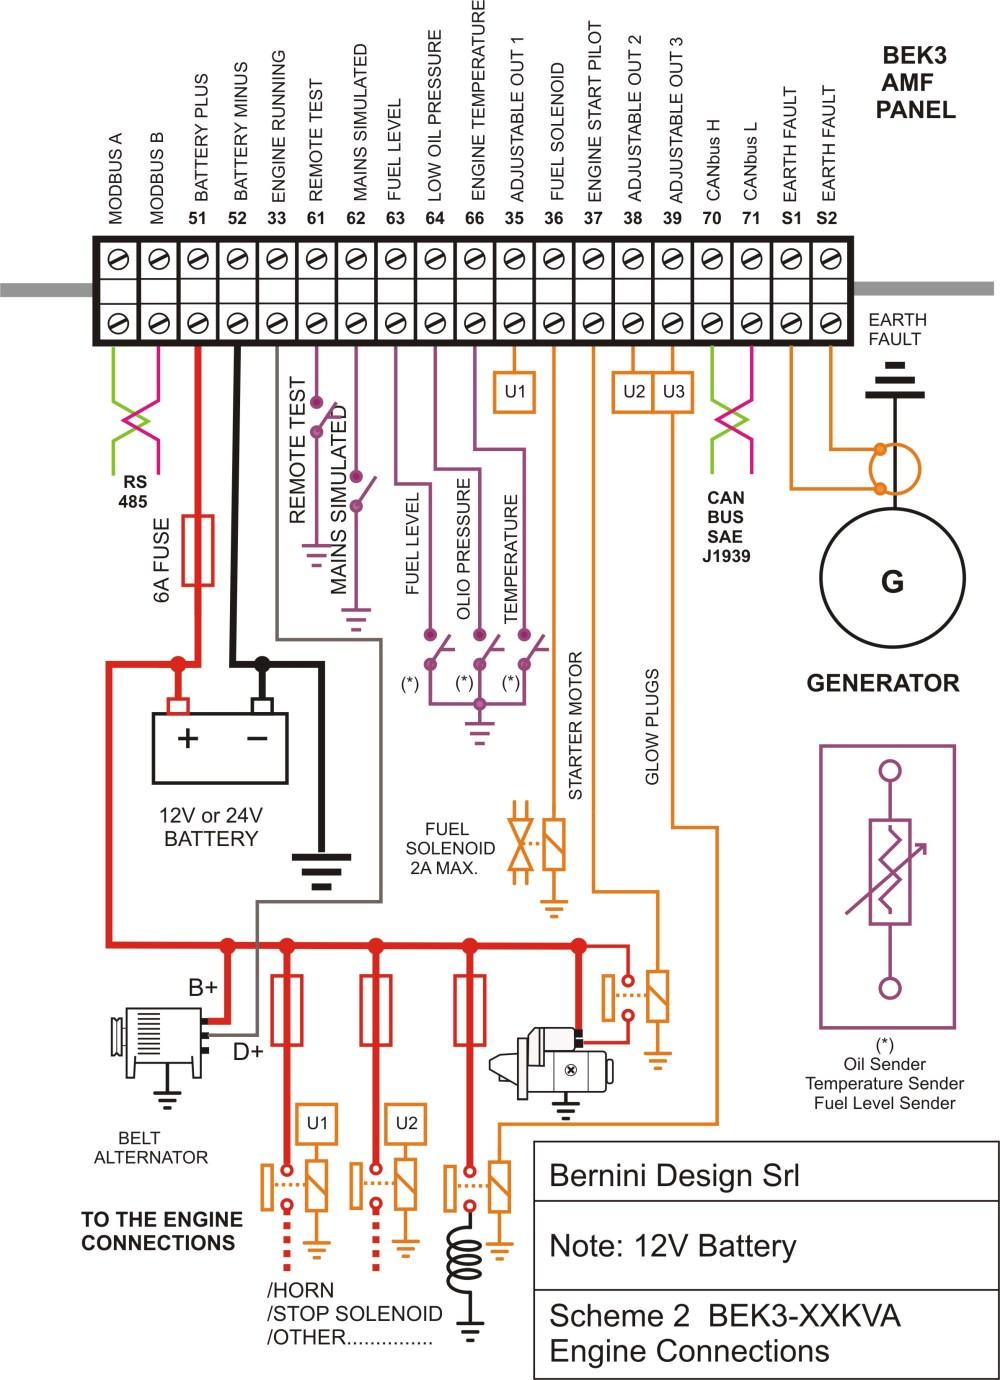 medium resolution of 2387x3295 patent us6181111 permanent magnet alternator system for battery